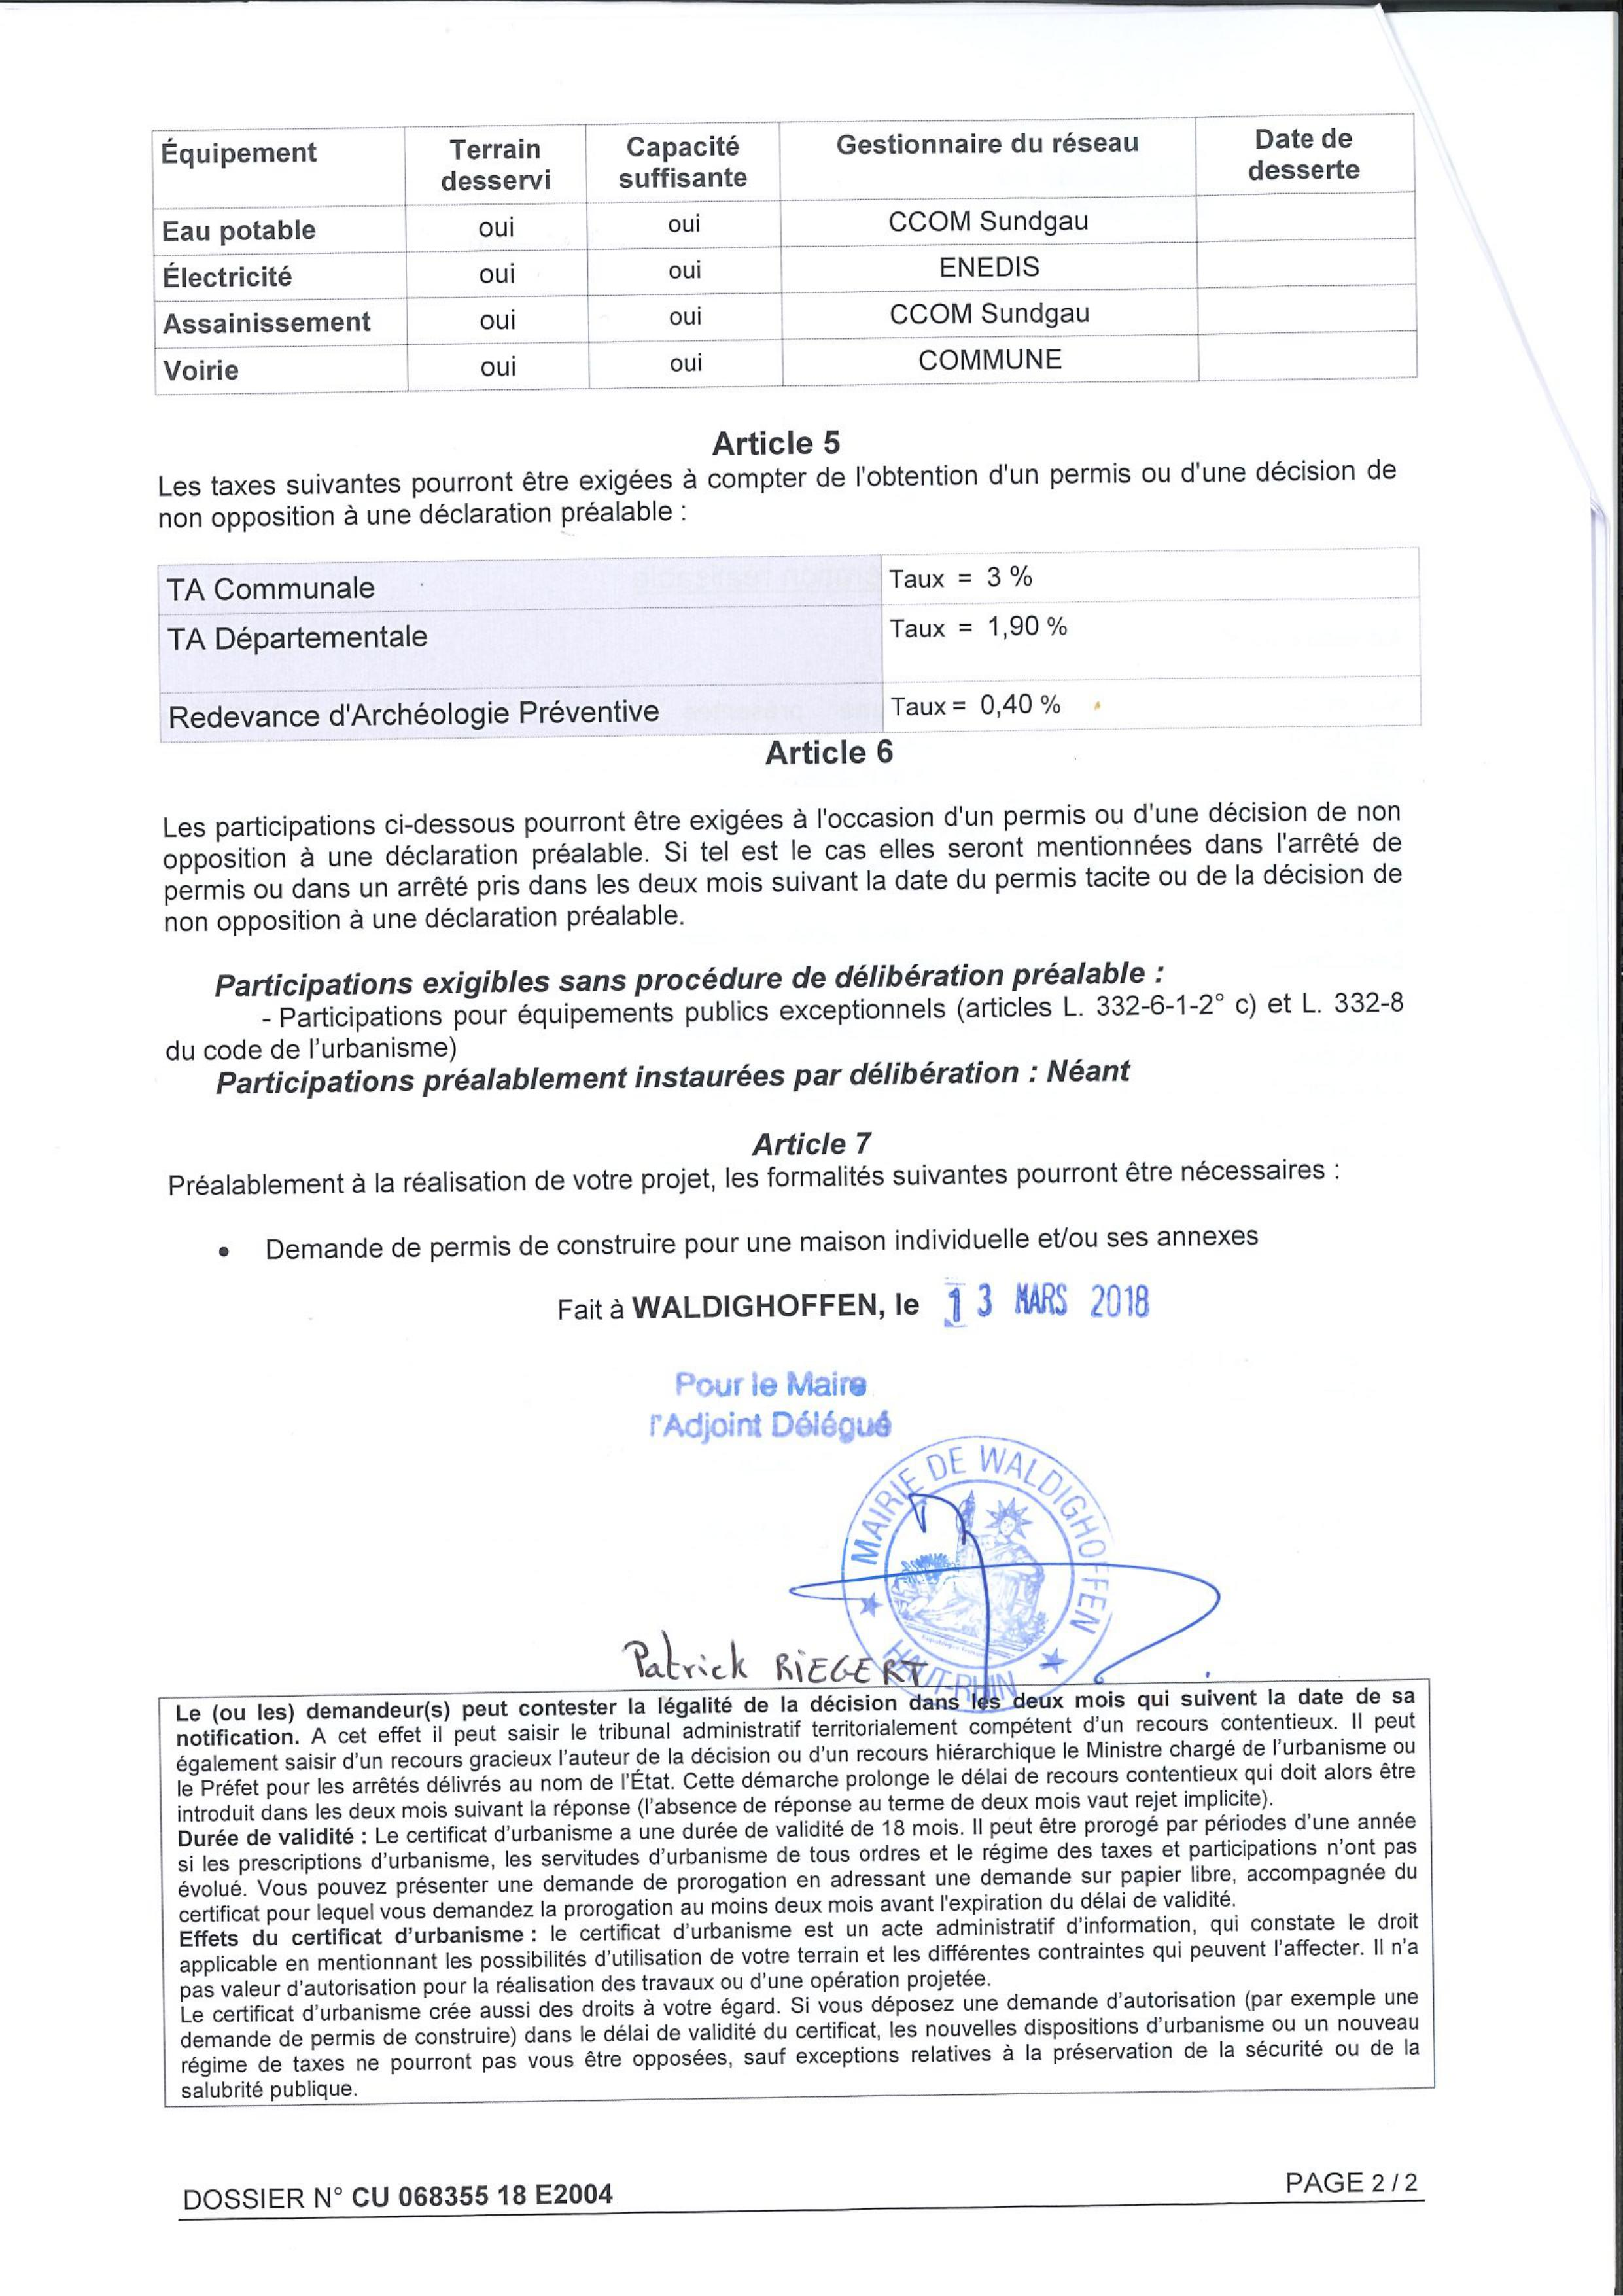 Certificat D Urbanisme Operationnel Etabli Pour Maitre Catherine